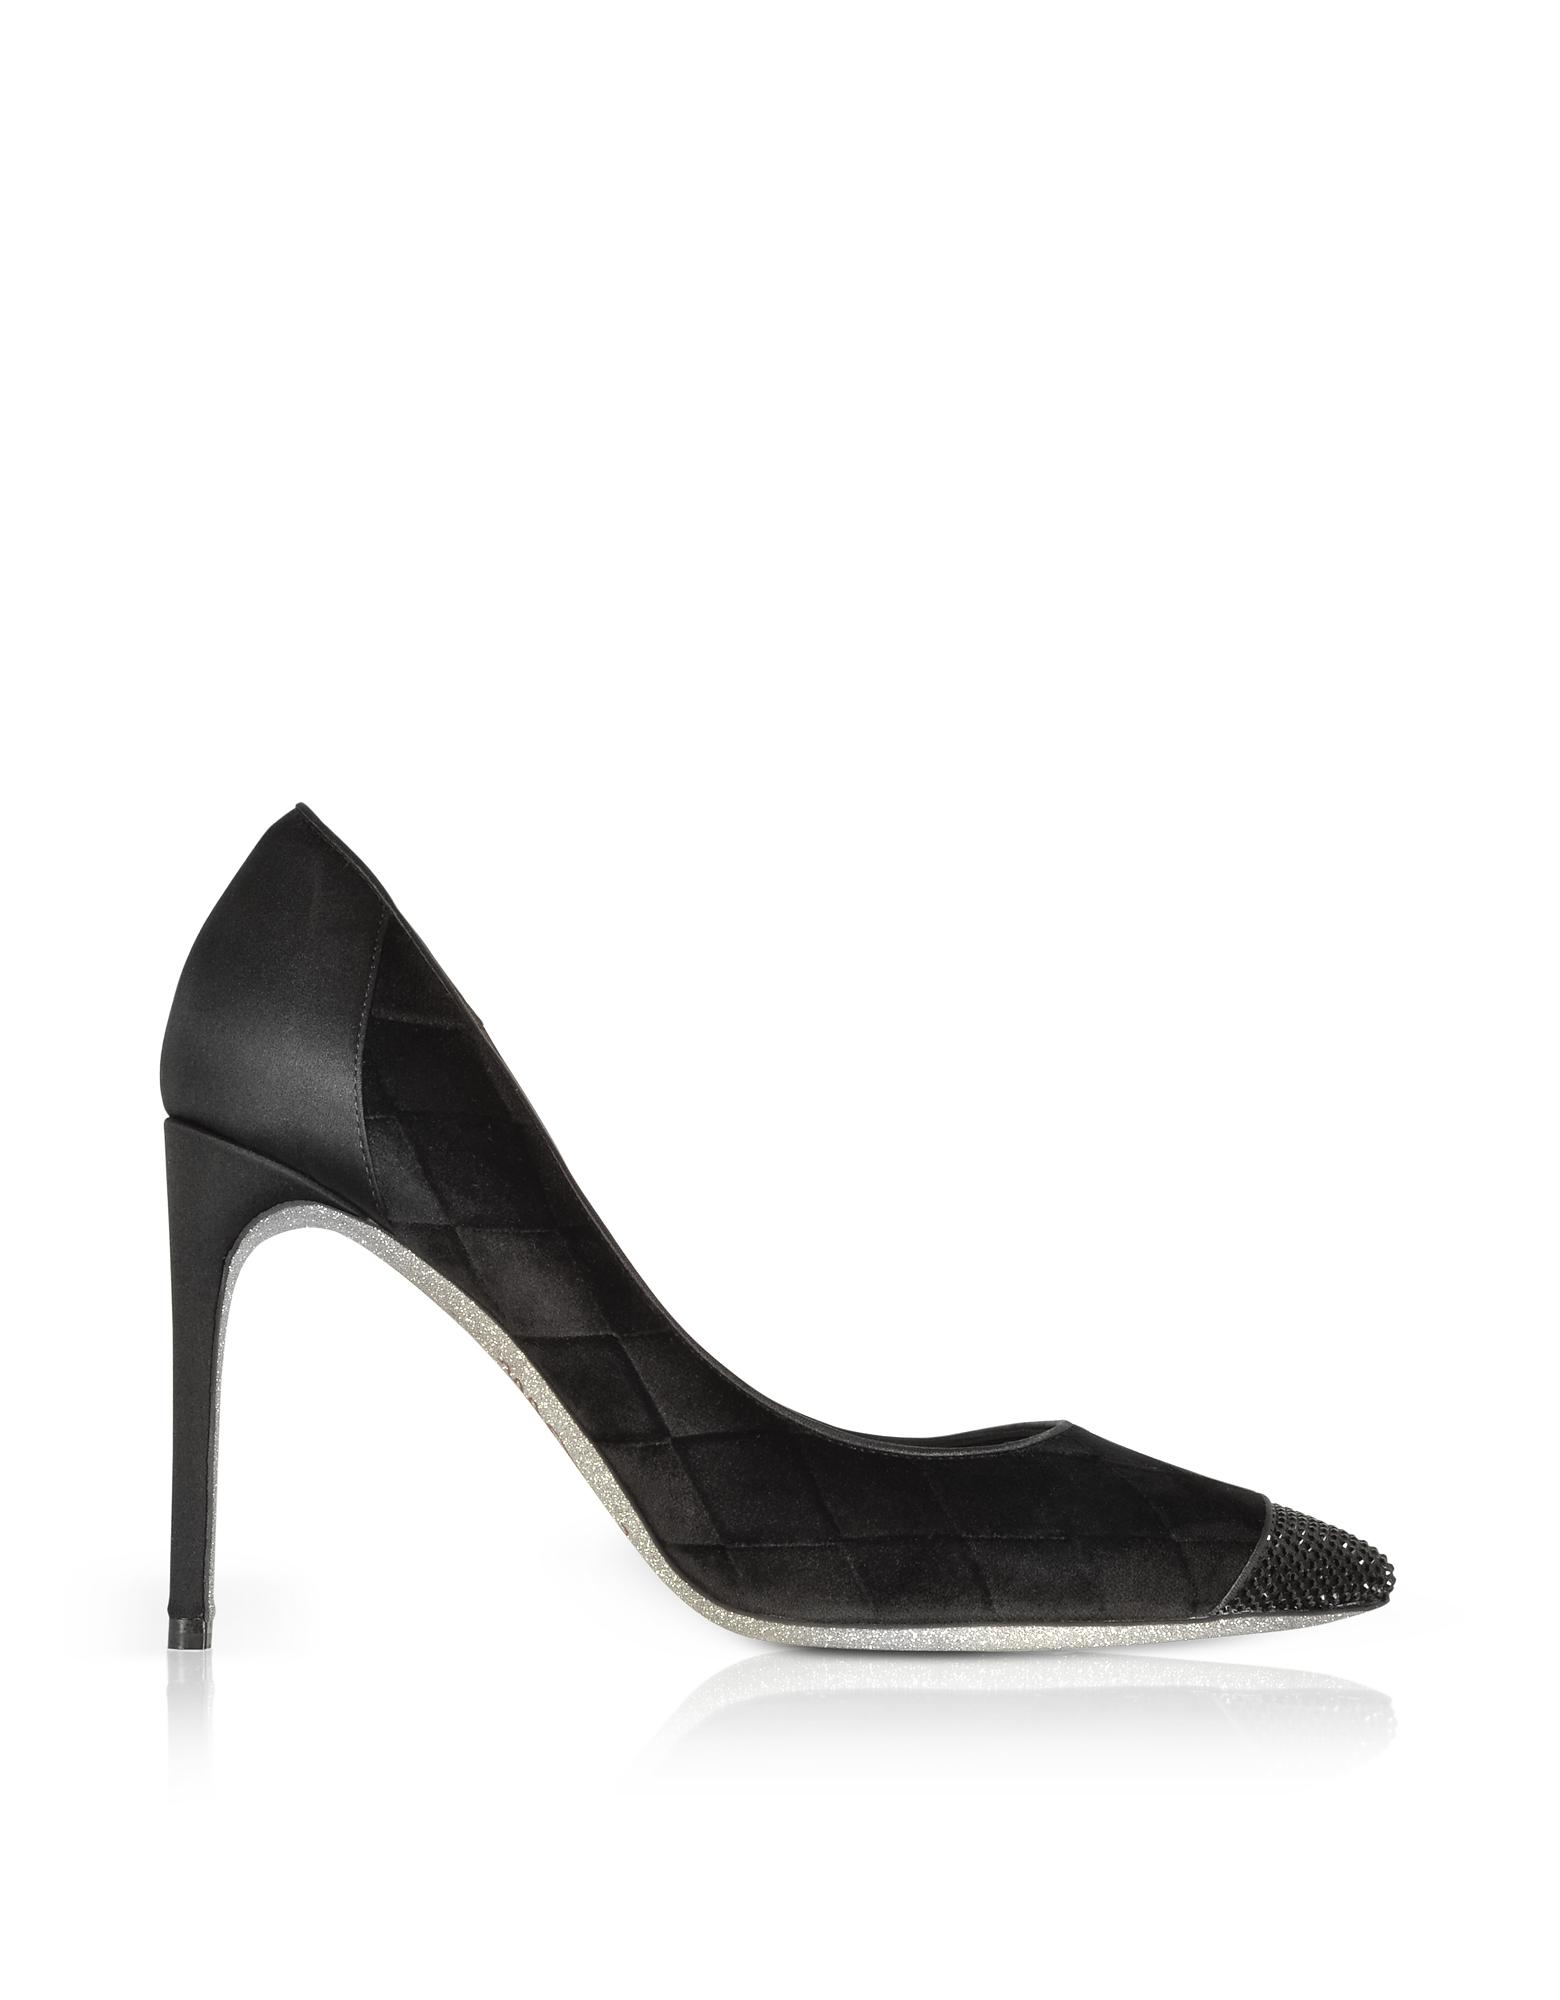 Image of Rene Caovilla Designer Shoes, Black Diamon Velvet Pumps w/Glitter Sole